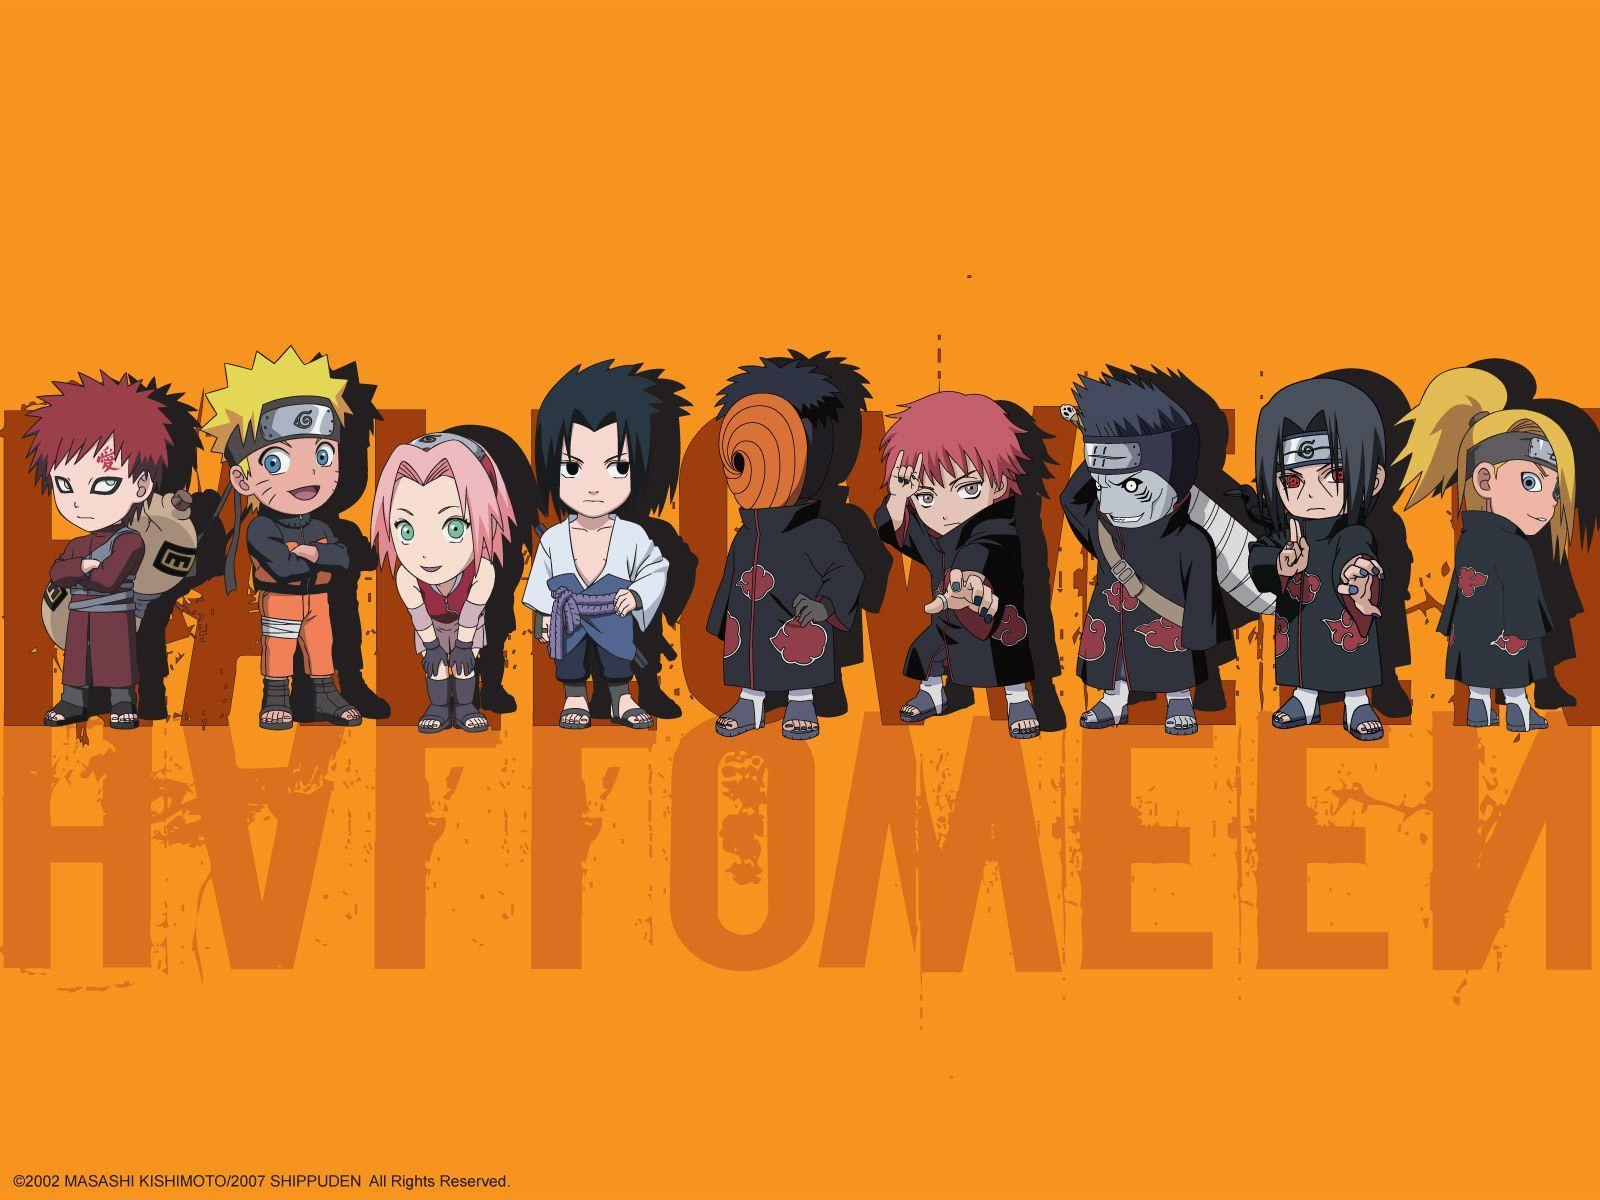 Naruto Chibi Wallpapers Top Free Naruto Chibi Backgrounds